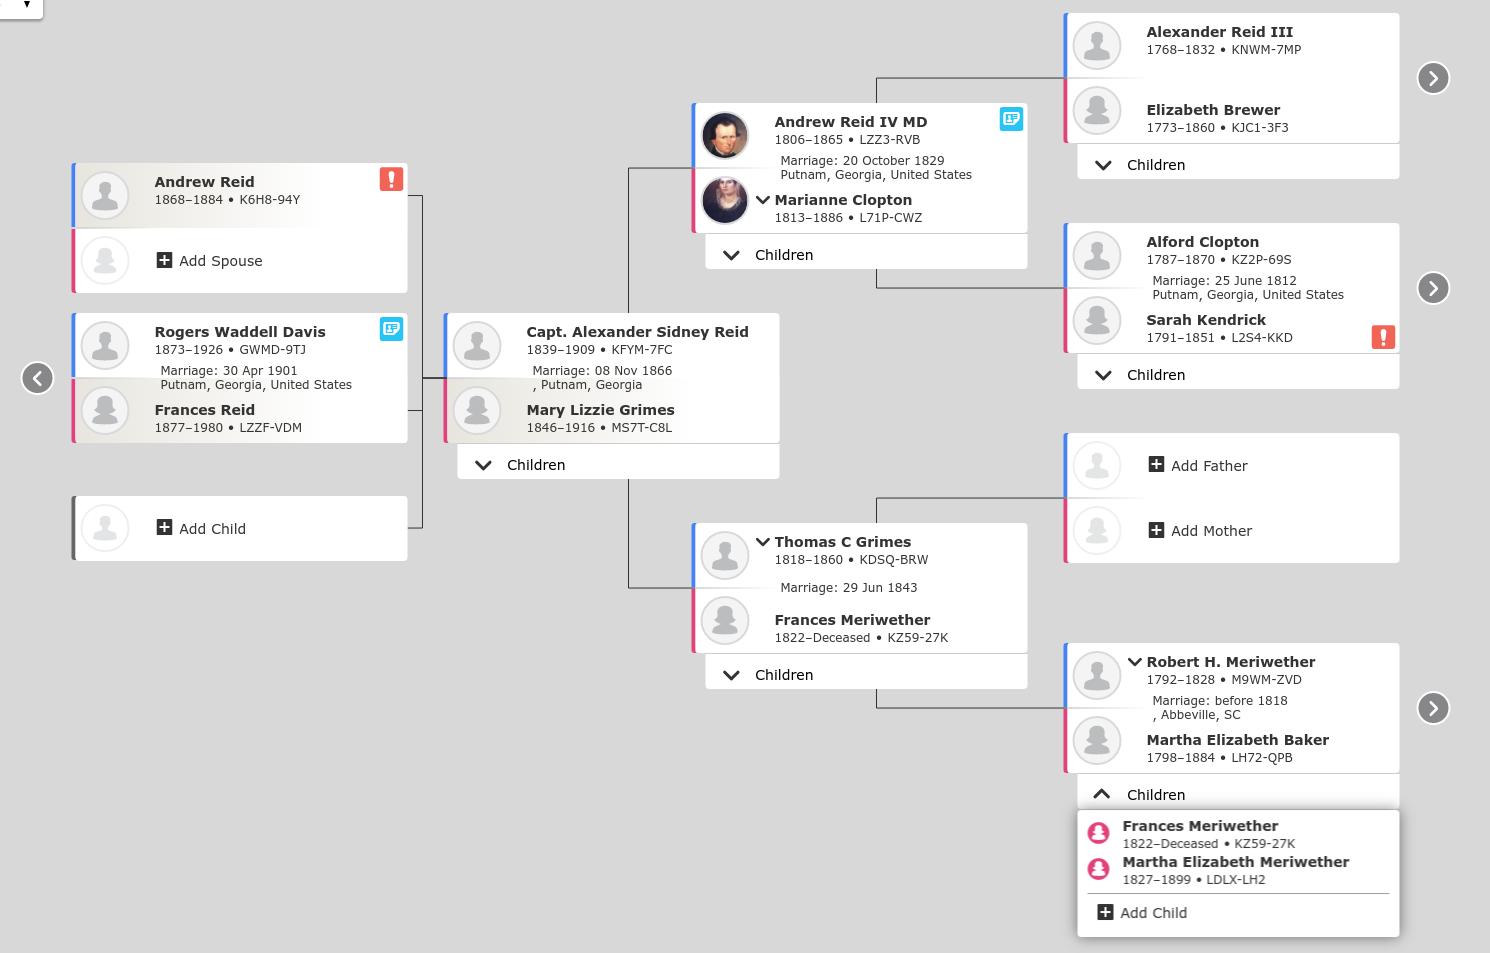 Family tree of Frances (Reid) Davis ancestors